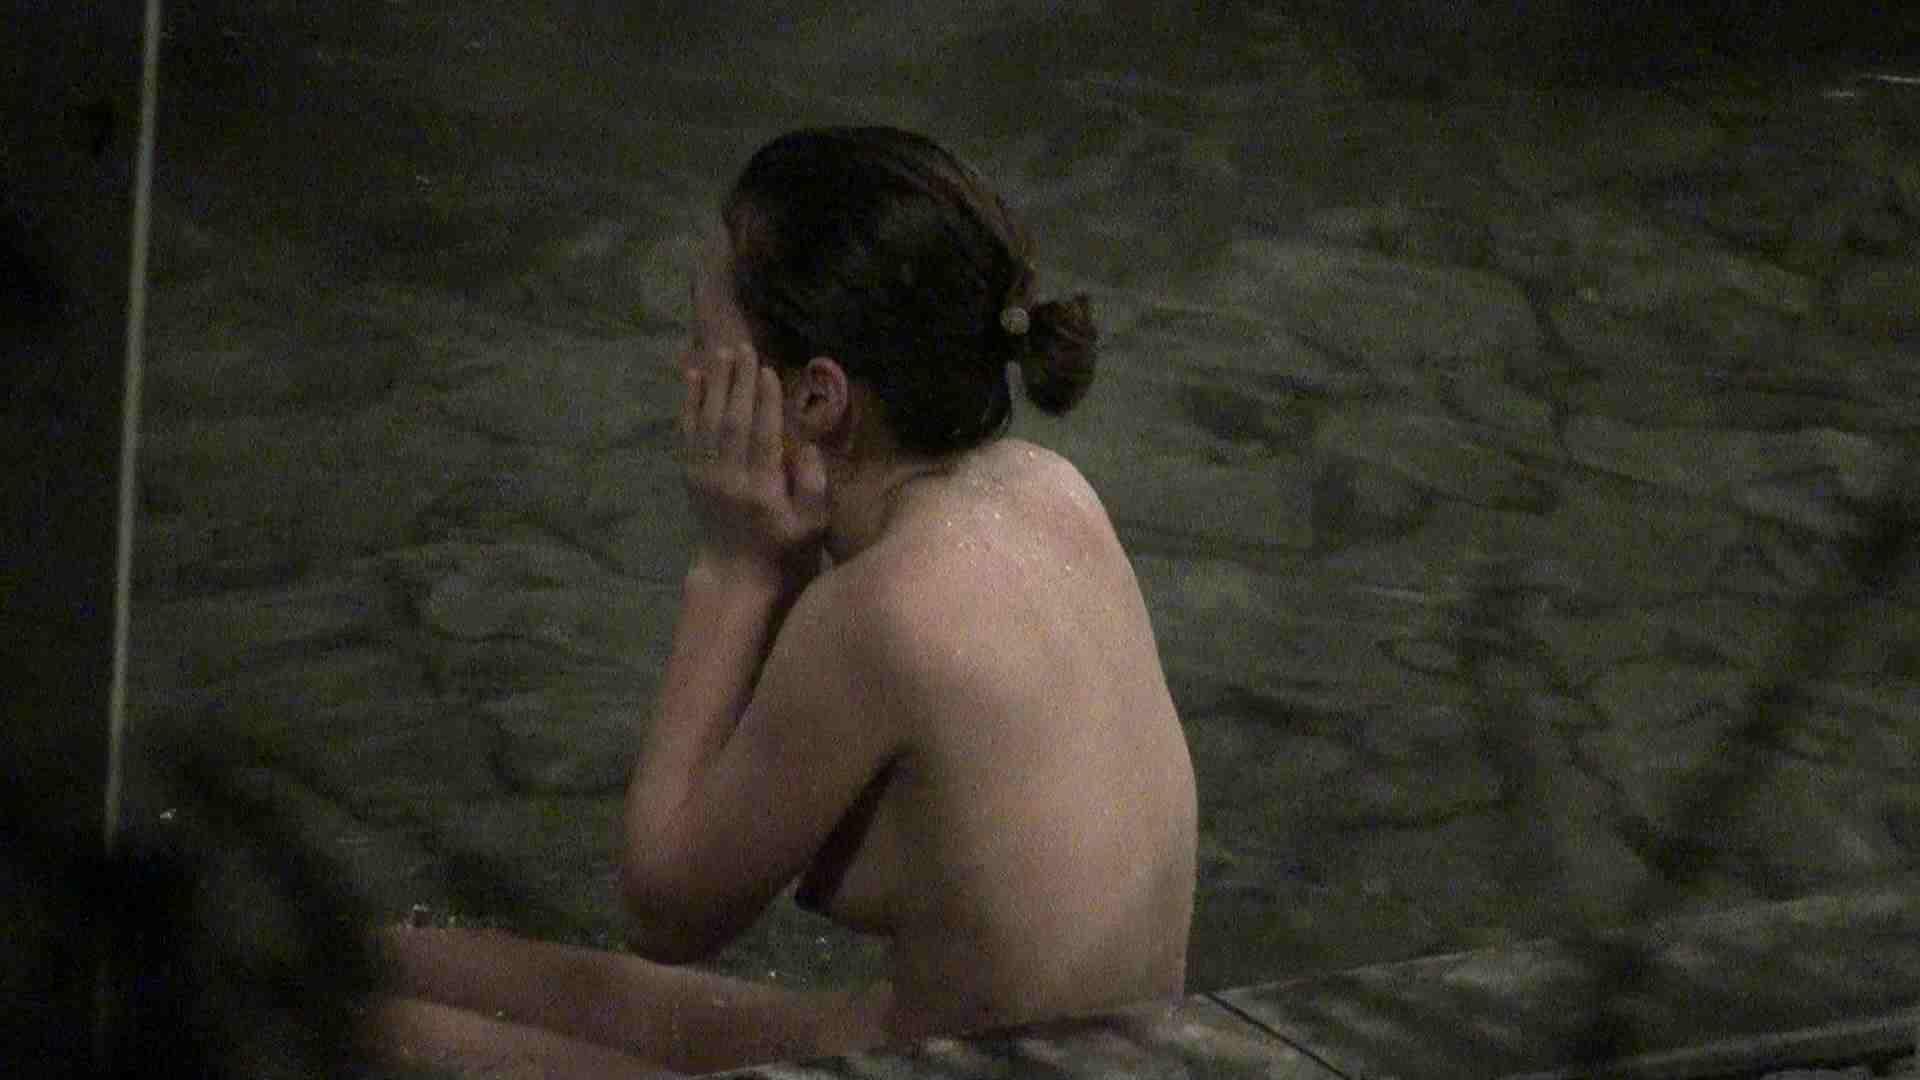 Aquaな露天風呂Vol.391 OLのエロ生活 | 露天風呂  58連発 52